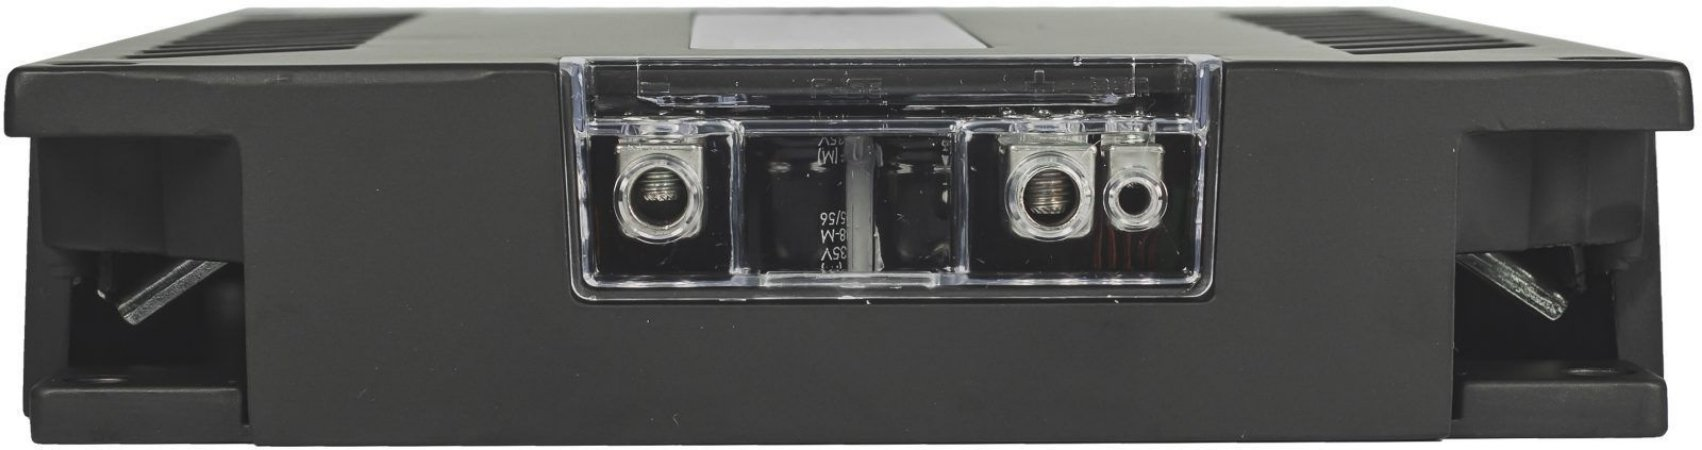 Modulo Amplificador Banda ELECTRA 5K1 5000W/RMS 1Ohms